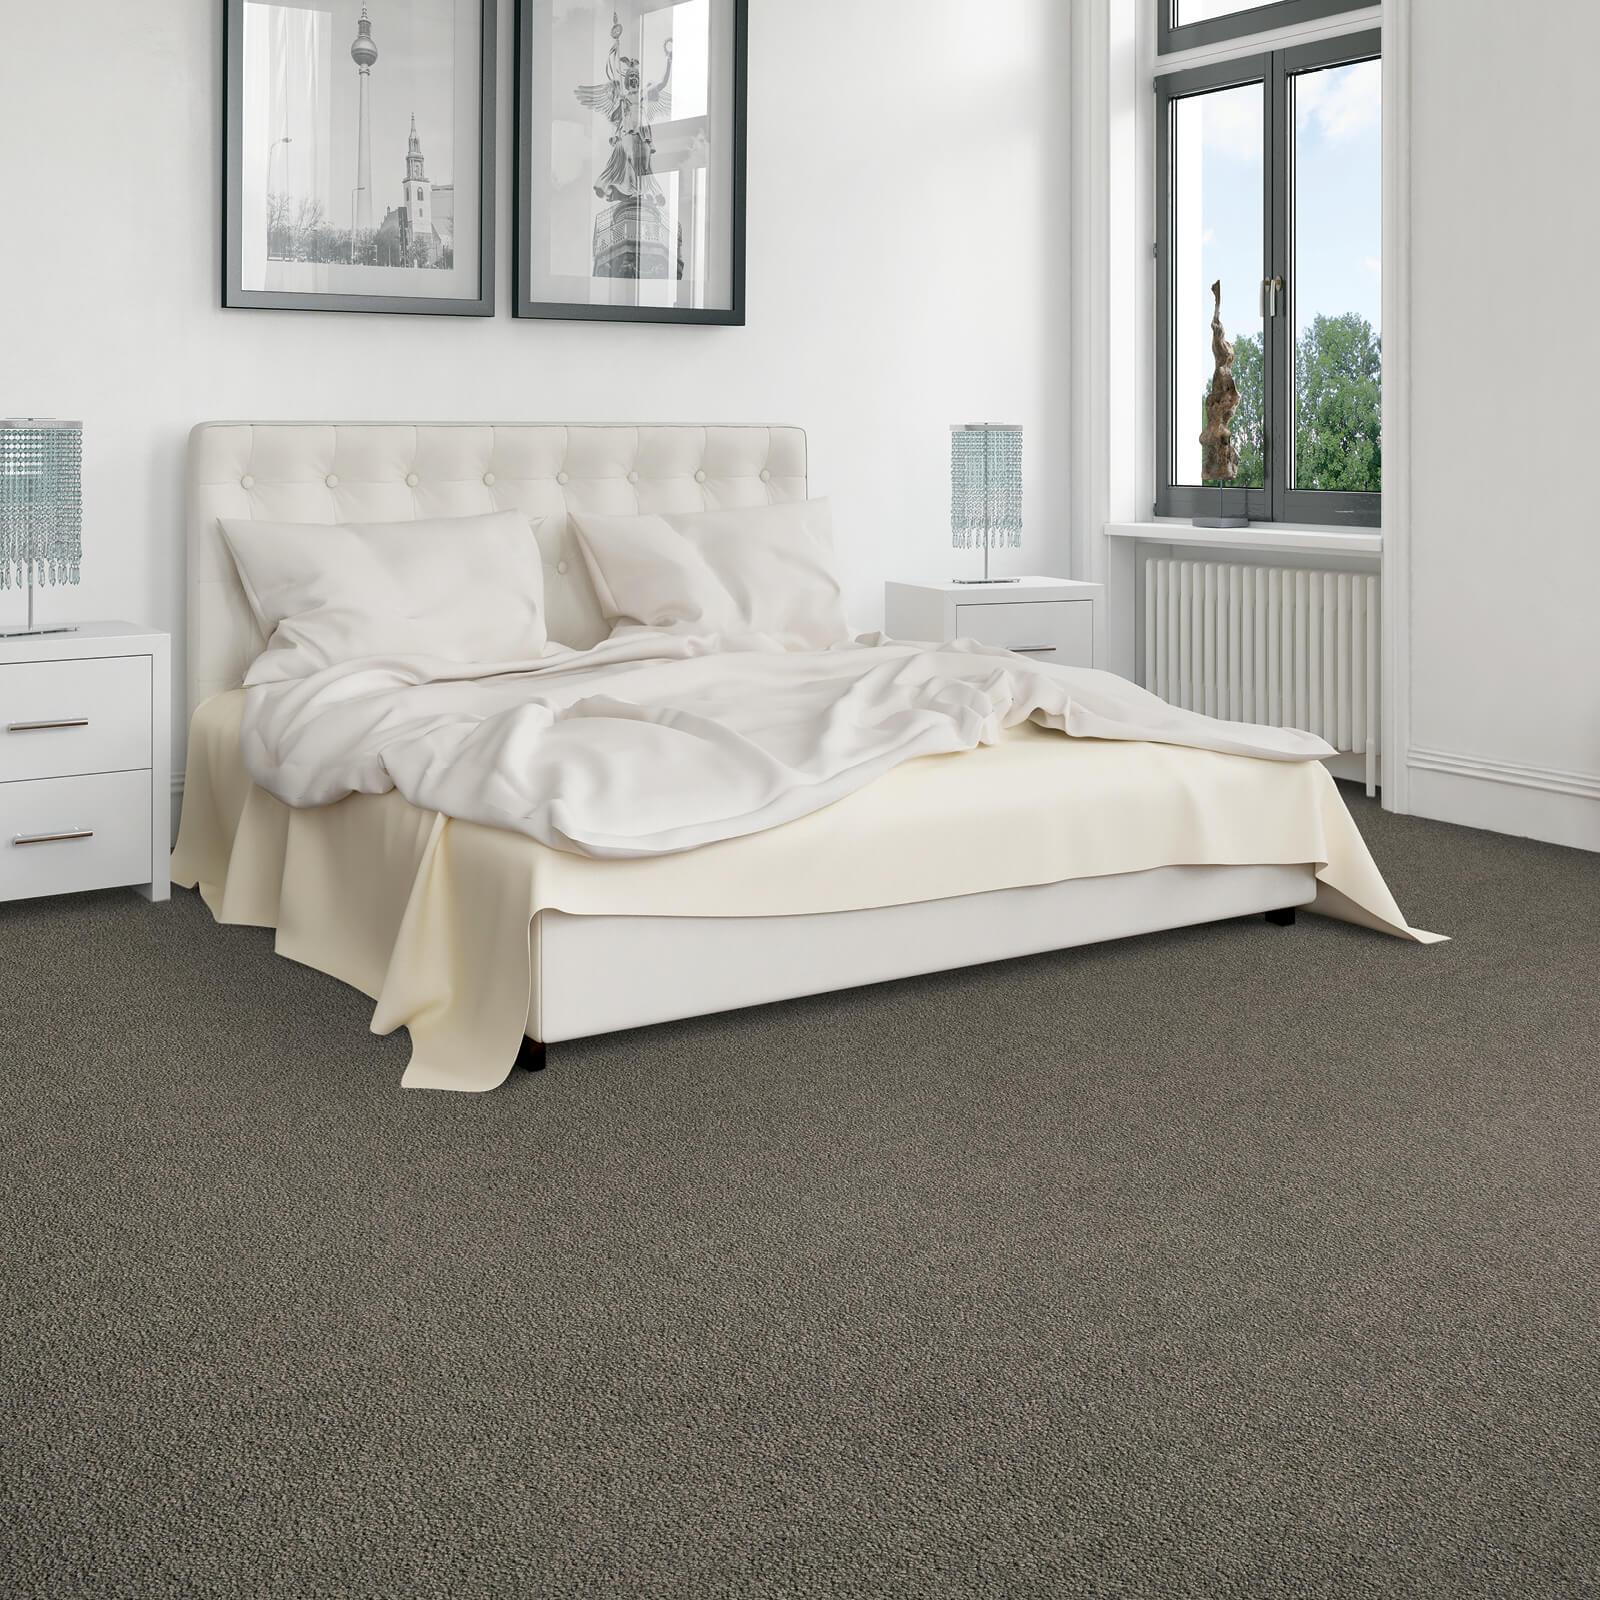 Carpeting in Bedroom   Haley's Flooring & Interiors